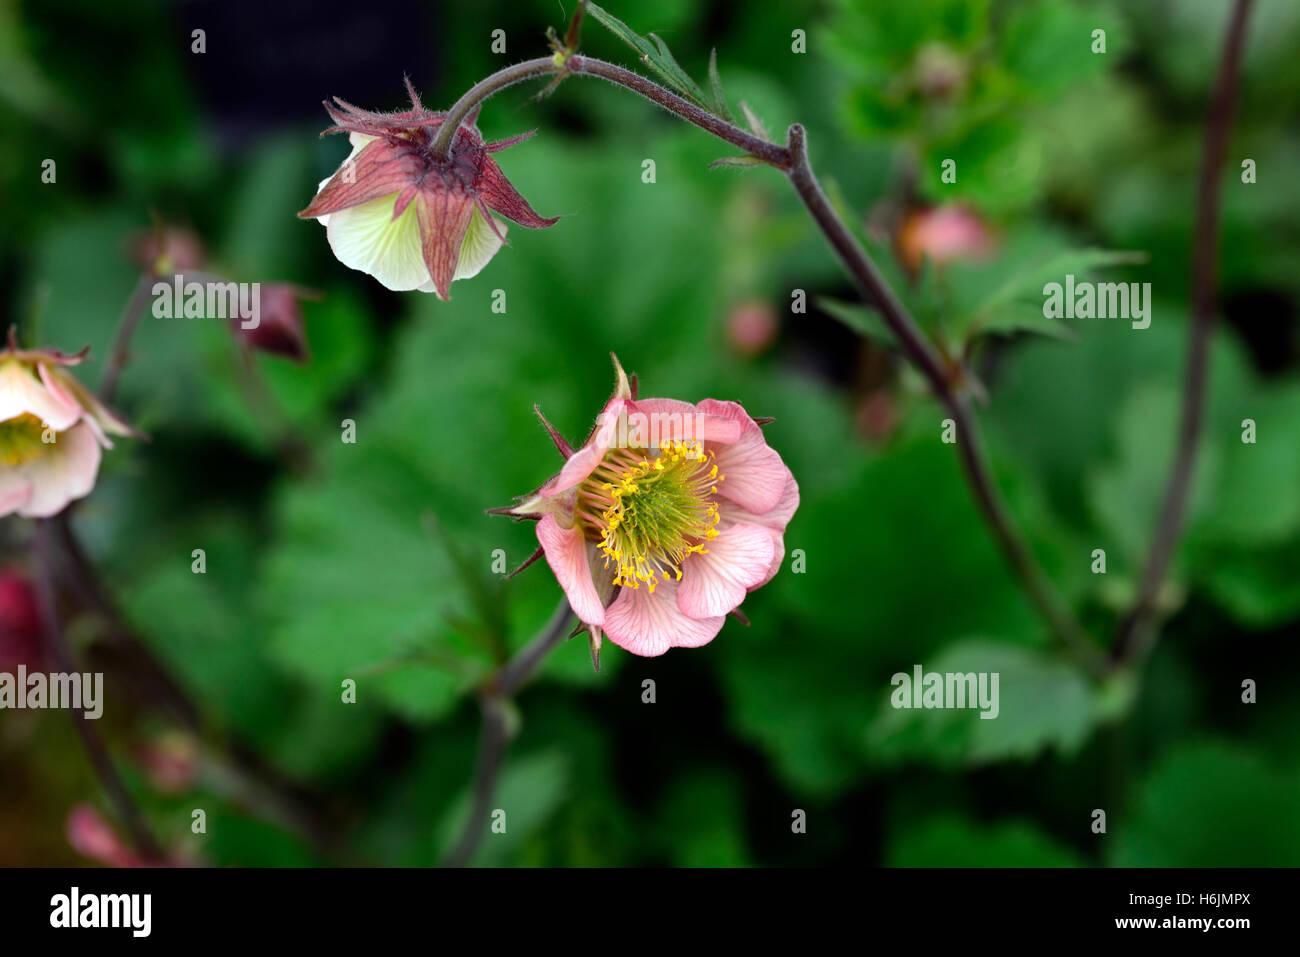 Geum flower stock photos geum flower stock images alamy geum bell bank avens pink geums flowers flower flowering perennial rm floral stock image mightylinksfo